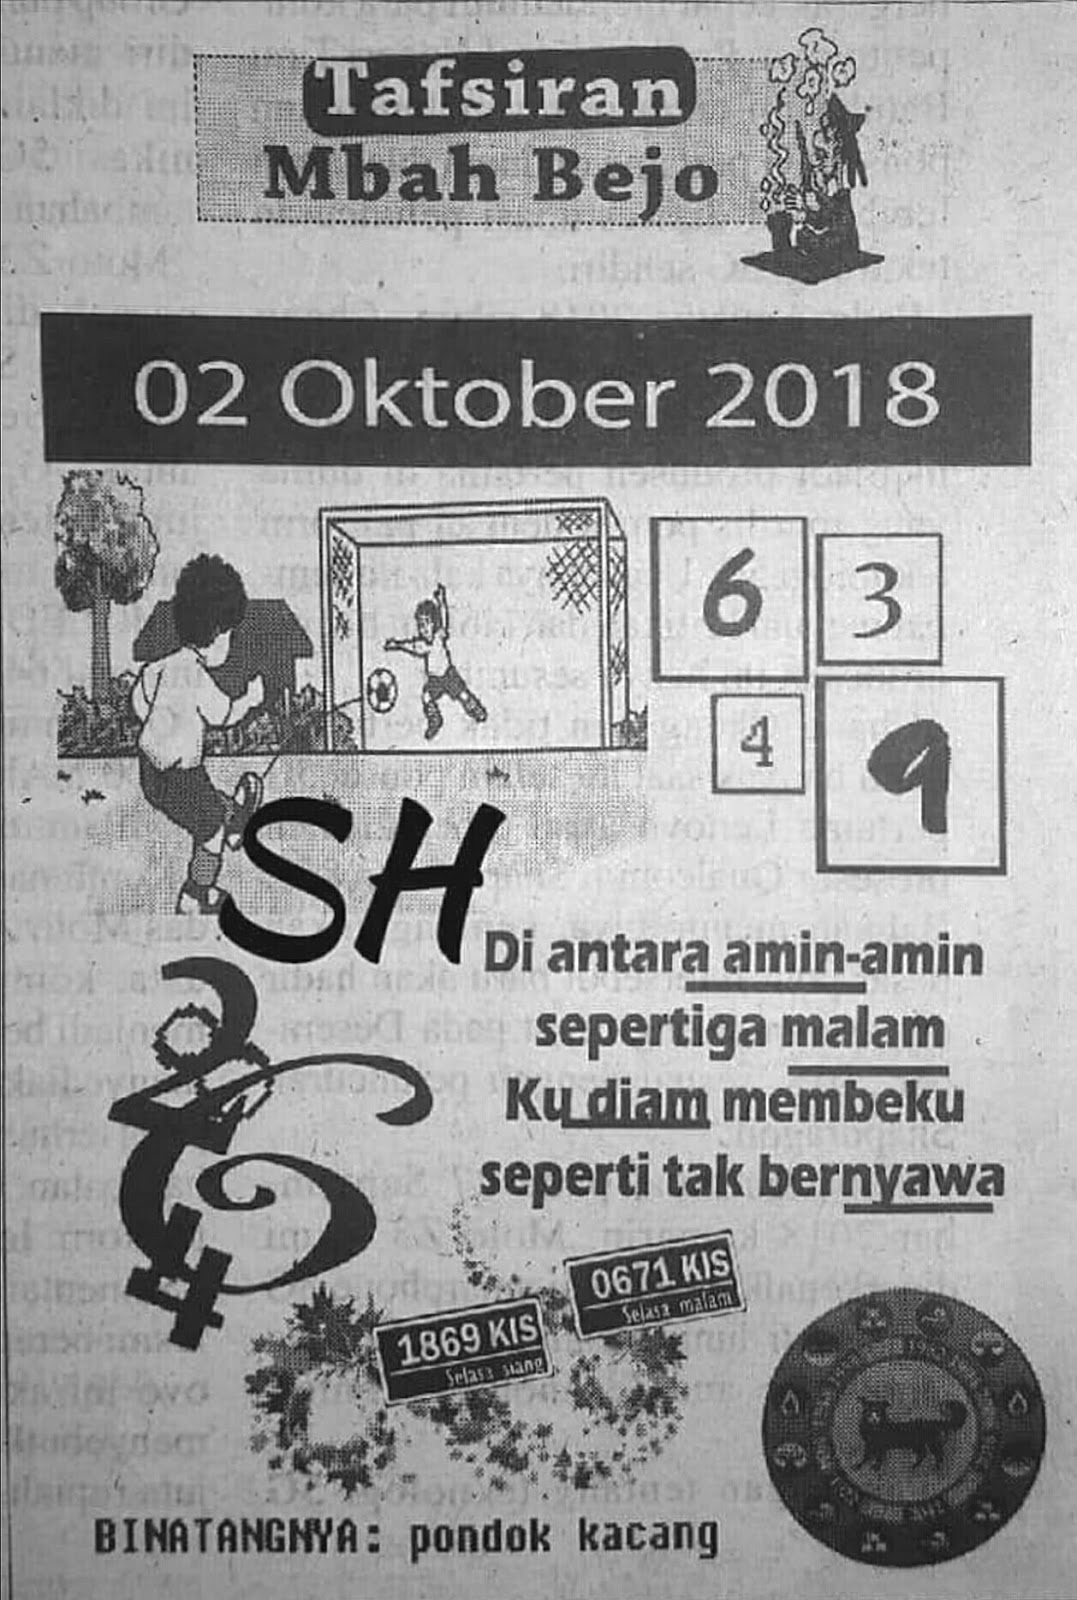 Forum Syair Hongkong Hk 2 Oktober 2018 Kode Syair Sgp Hk Sd Motesia